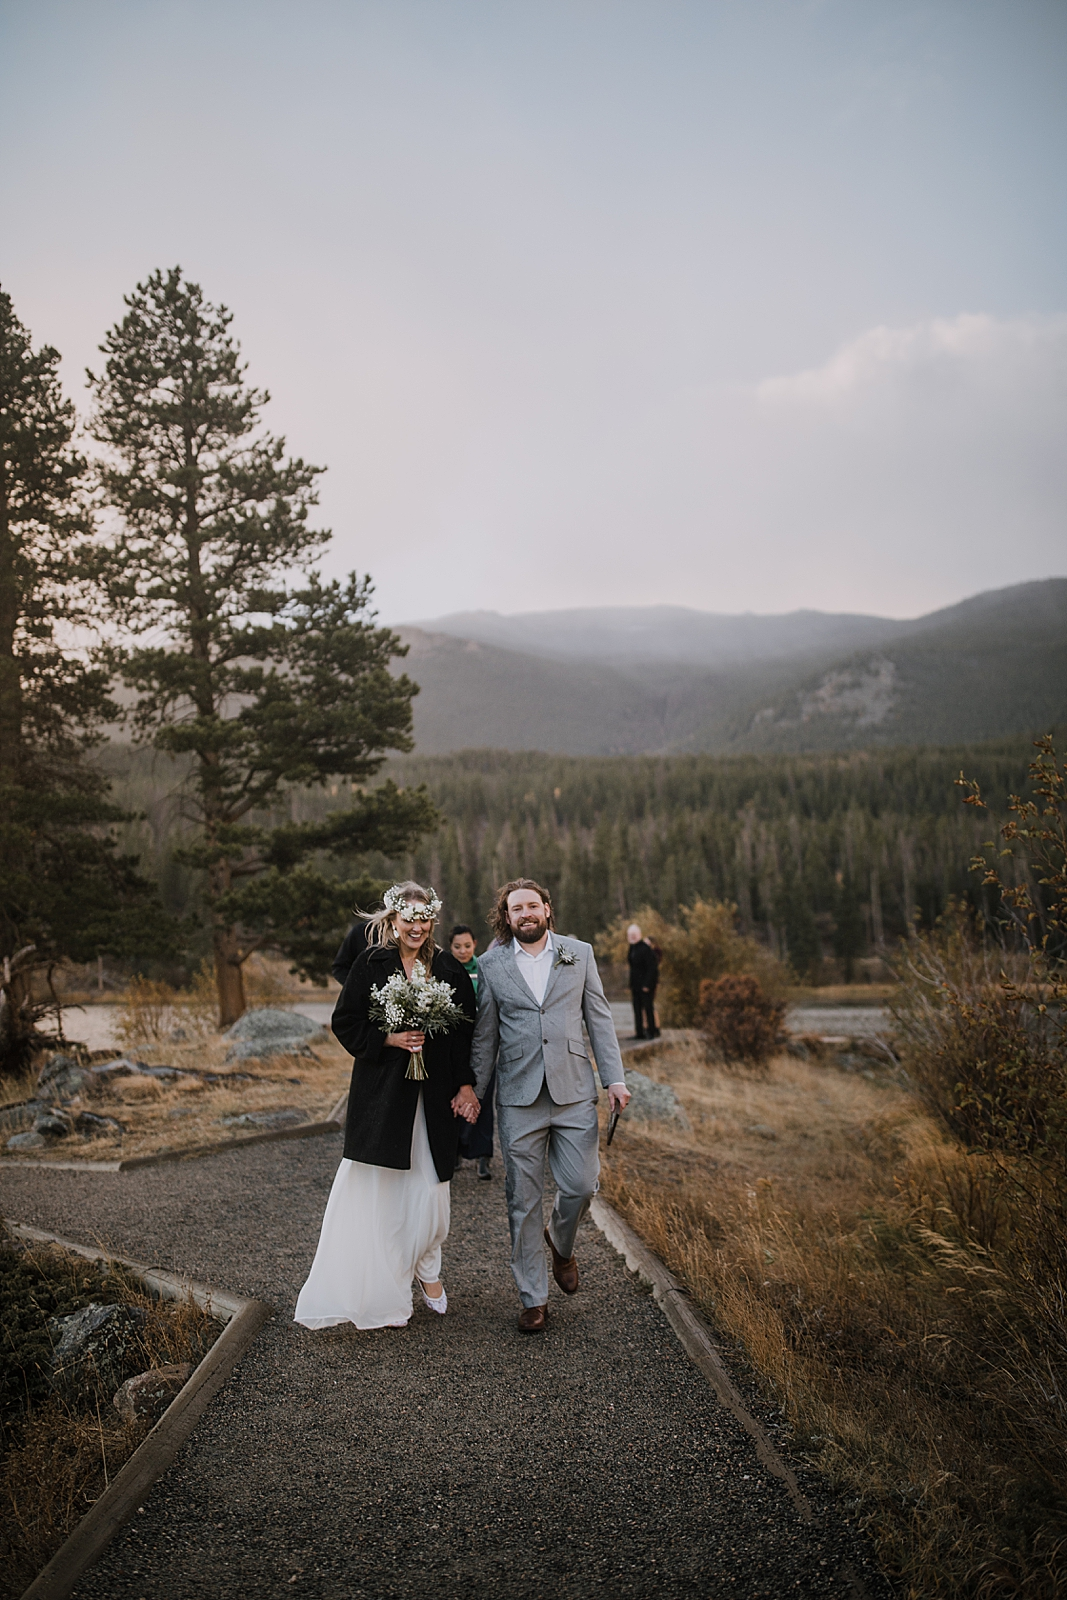 hiking couple, sprague lake dock elopement, sunrise elopement, colorado elopement, sprague lake elopement, rocky mountain national park elopement, adventurous colorado hiking elopement